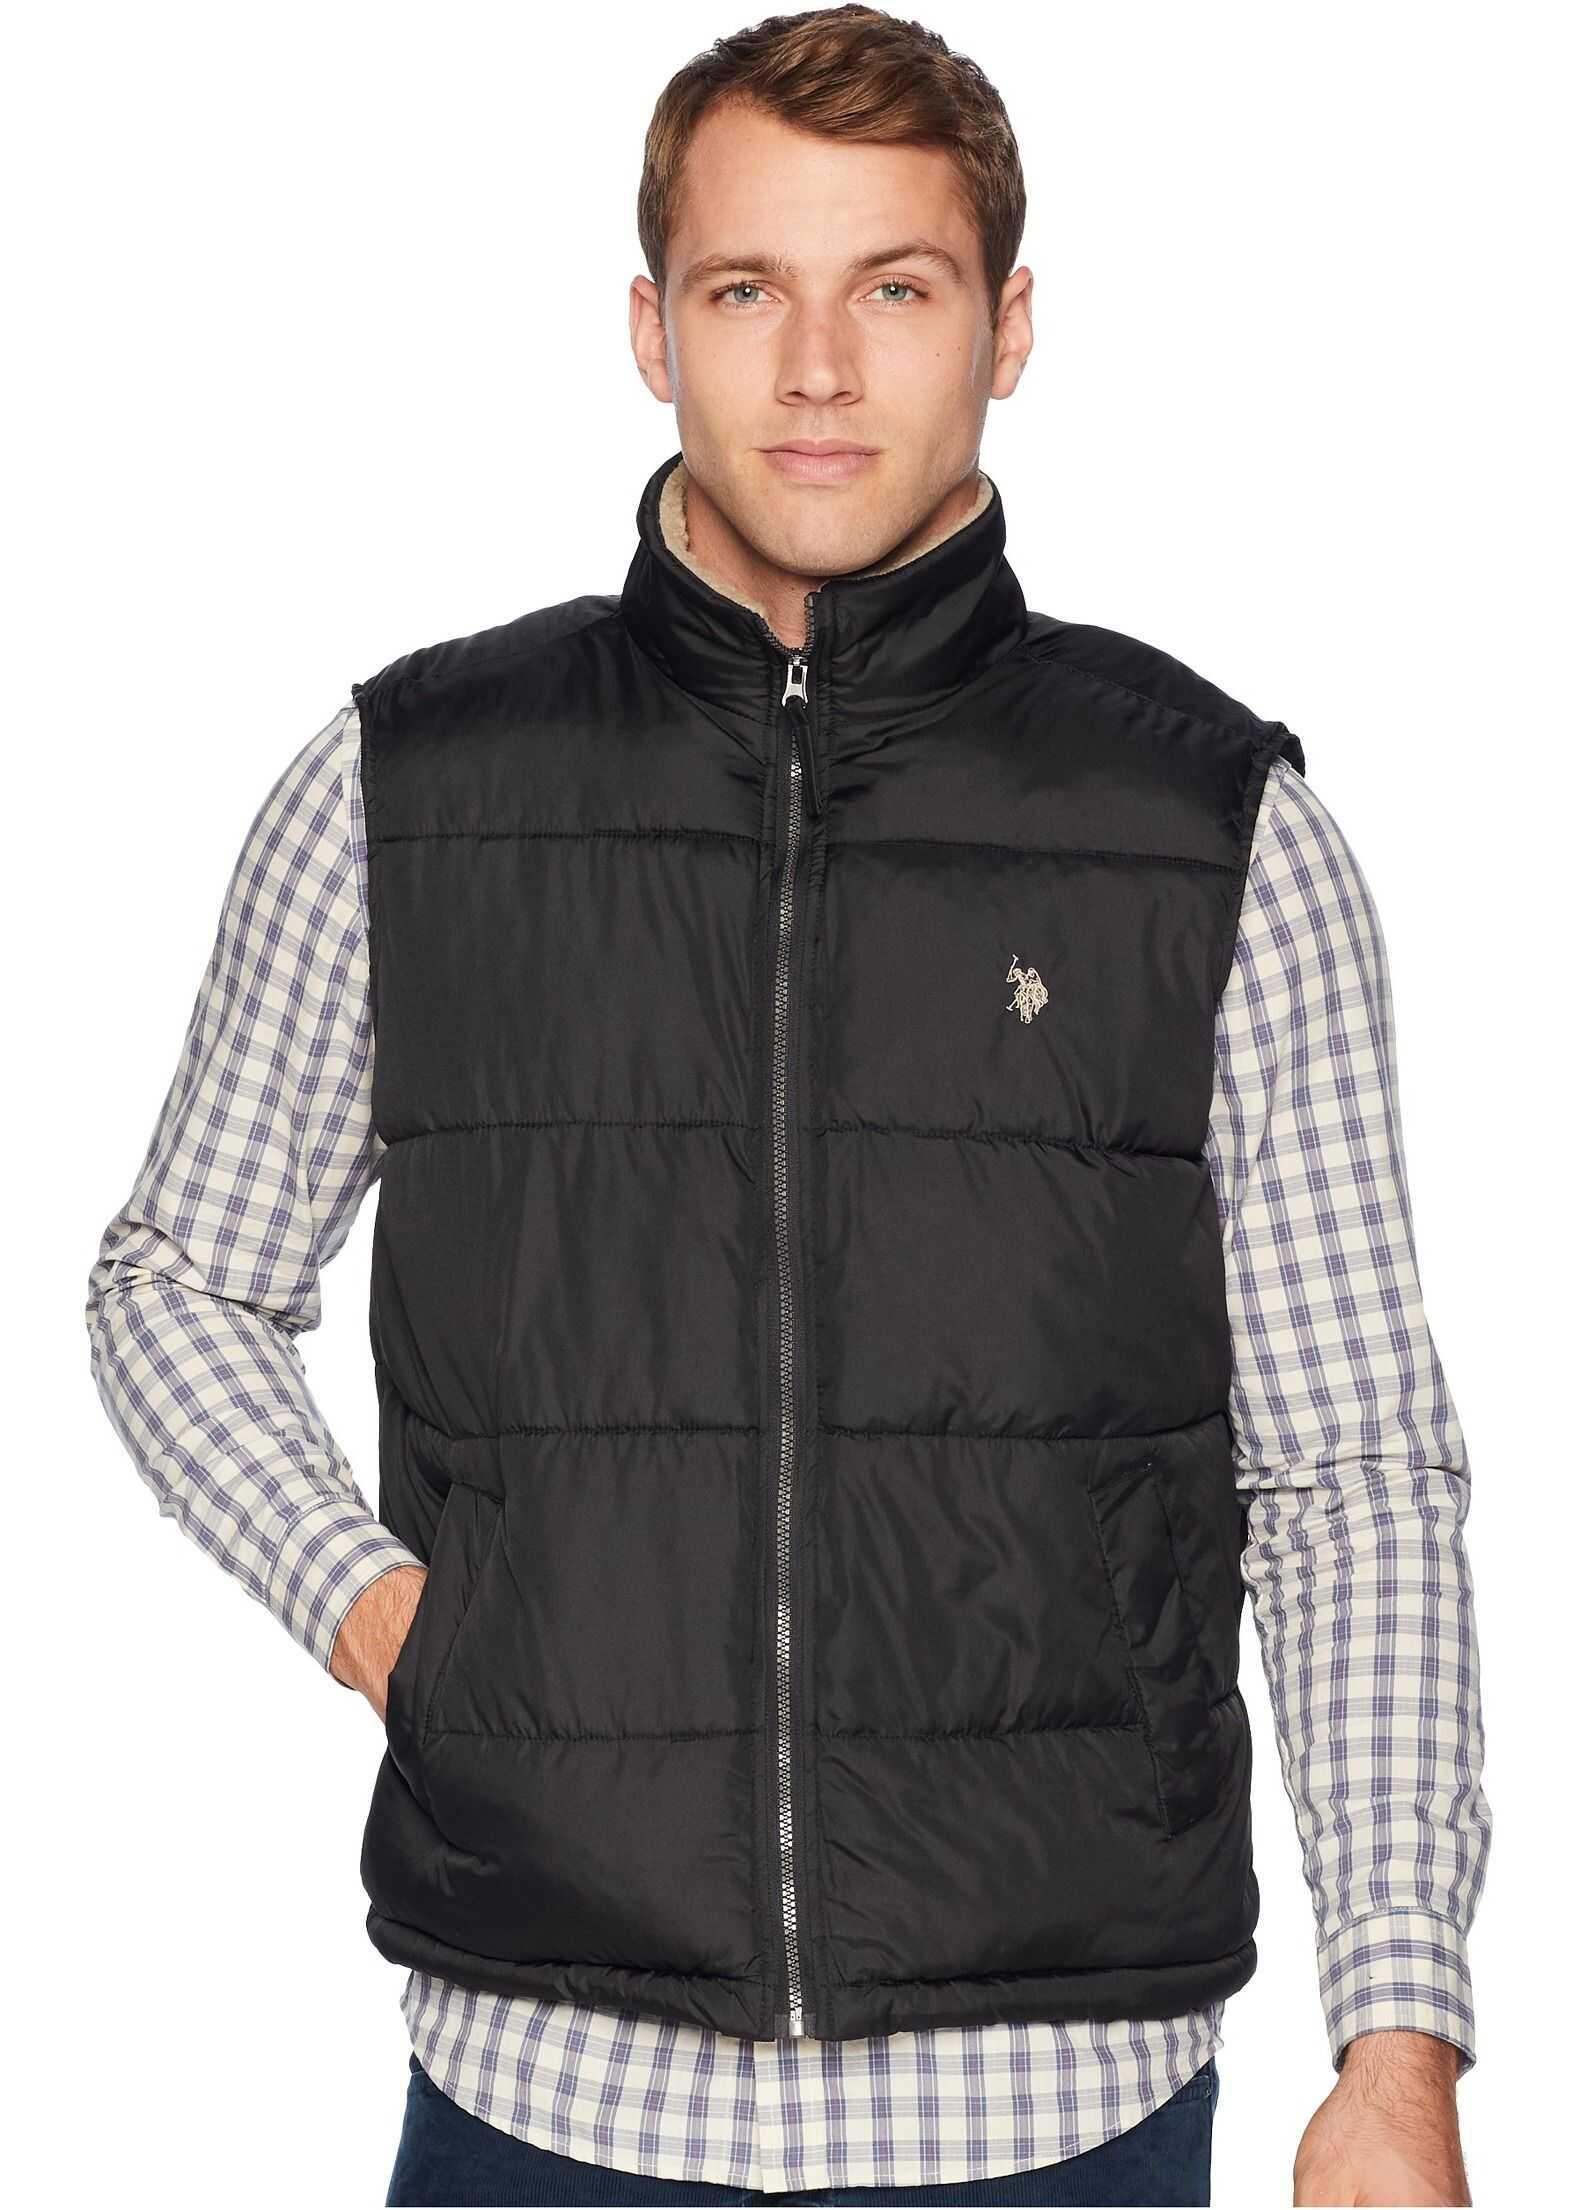 U.S. POLO ASSN. Signature Vest Sherpa Collar Black